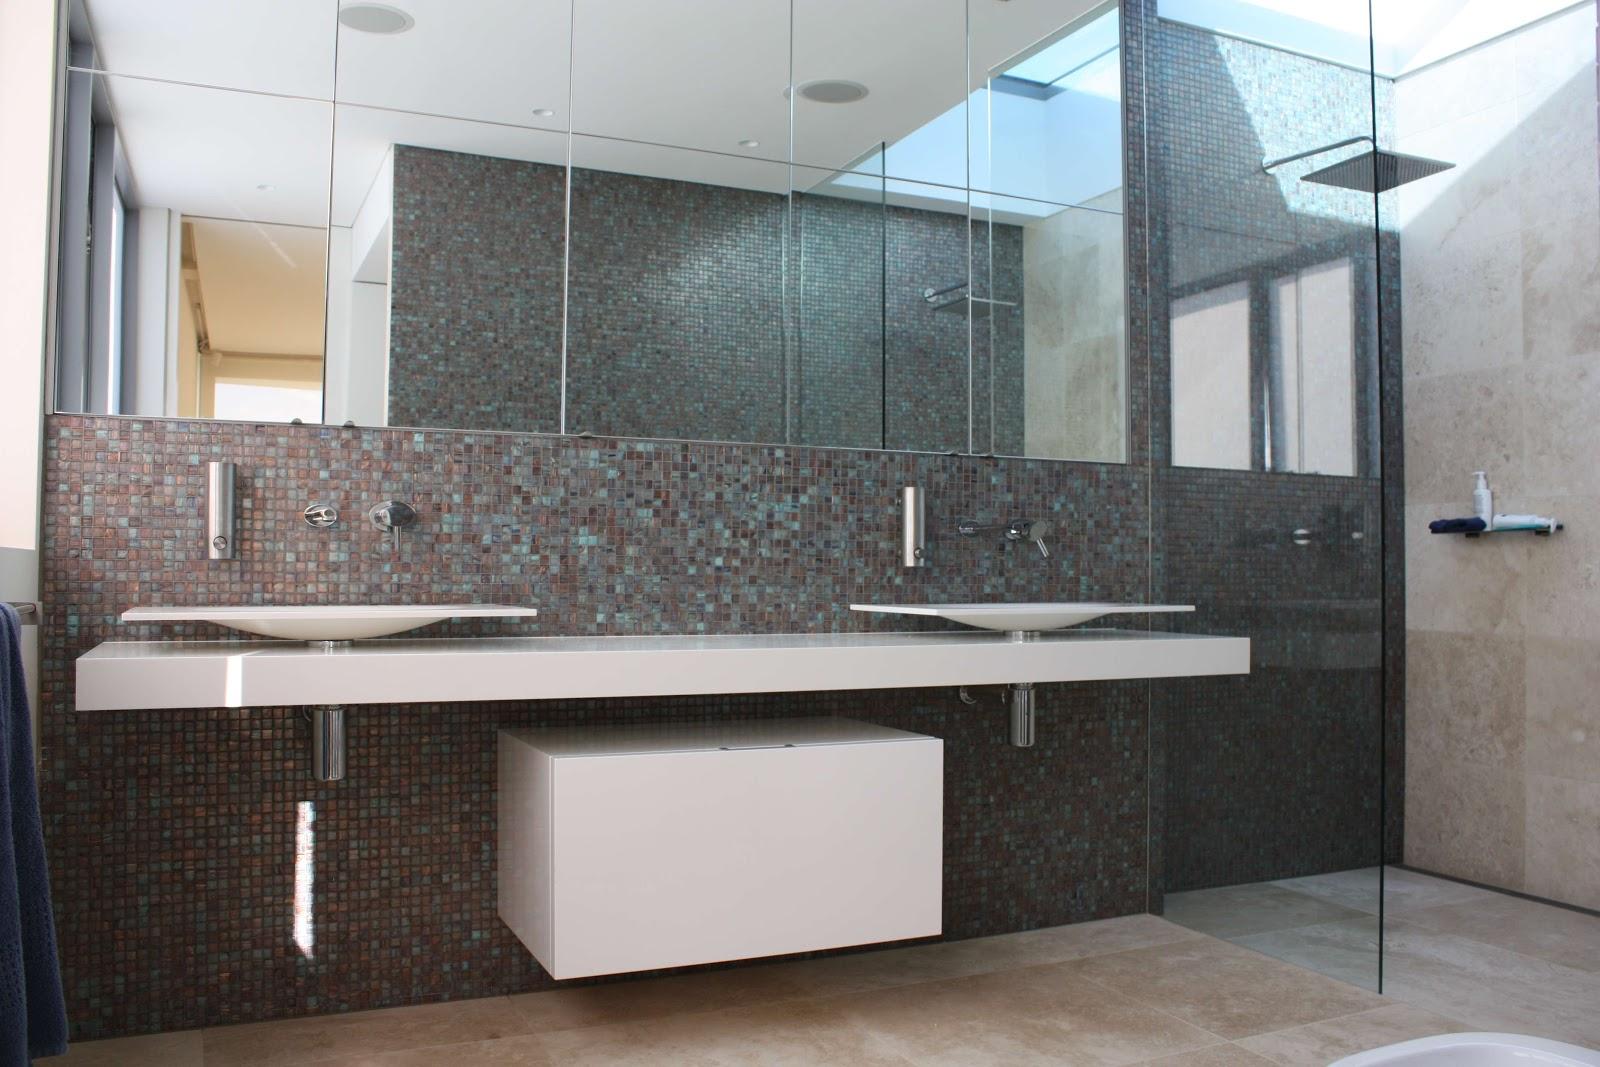 Travertine Bathrooms The Natural Choice Modern Design